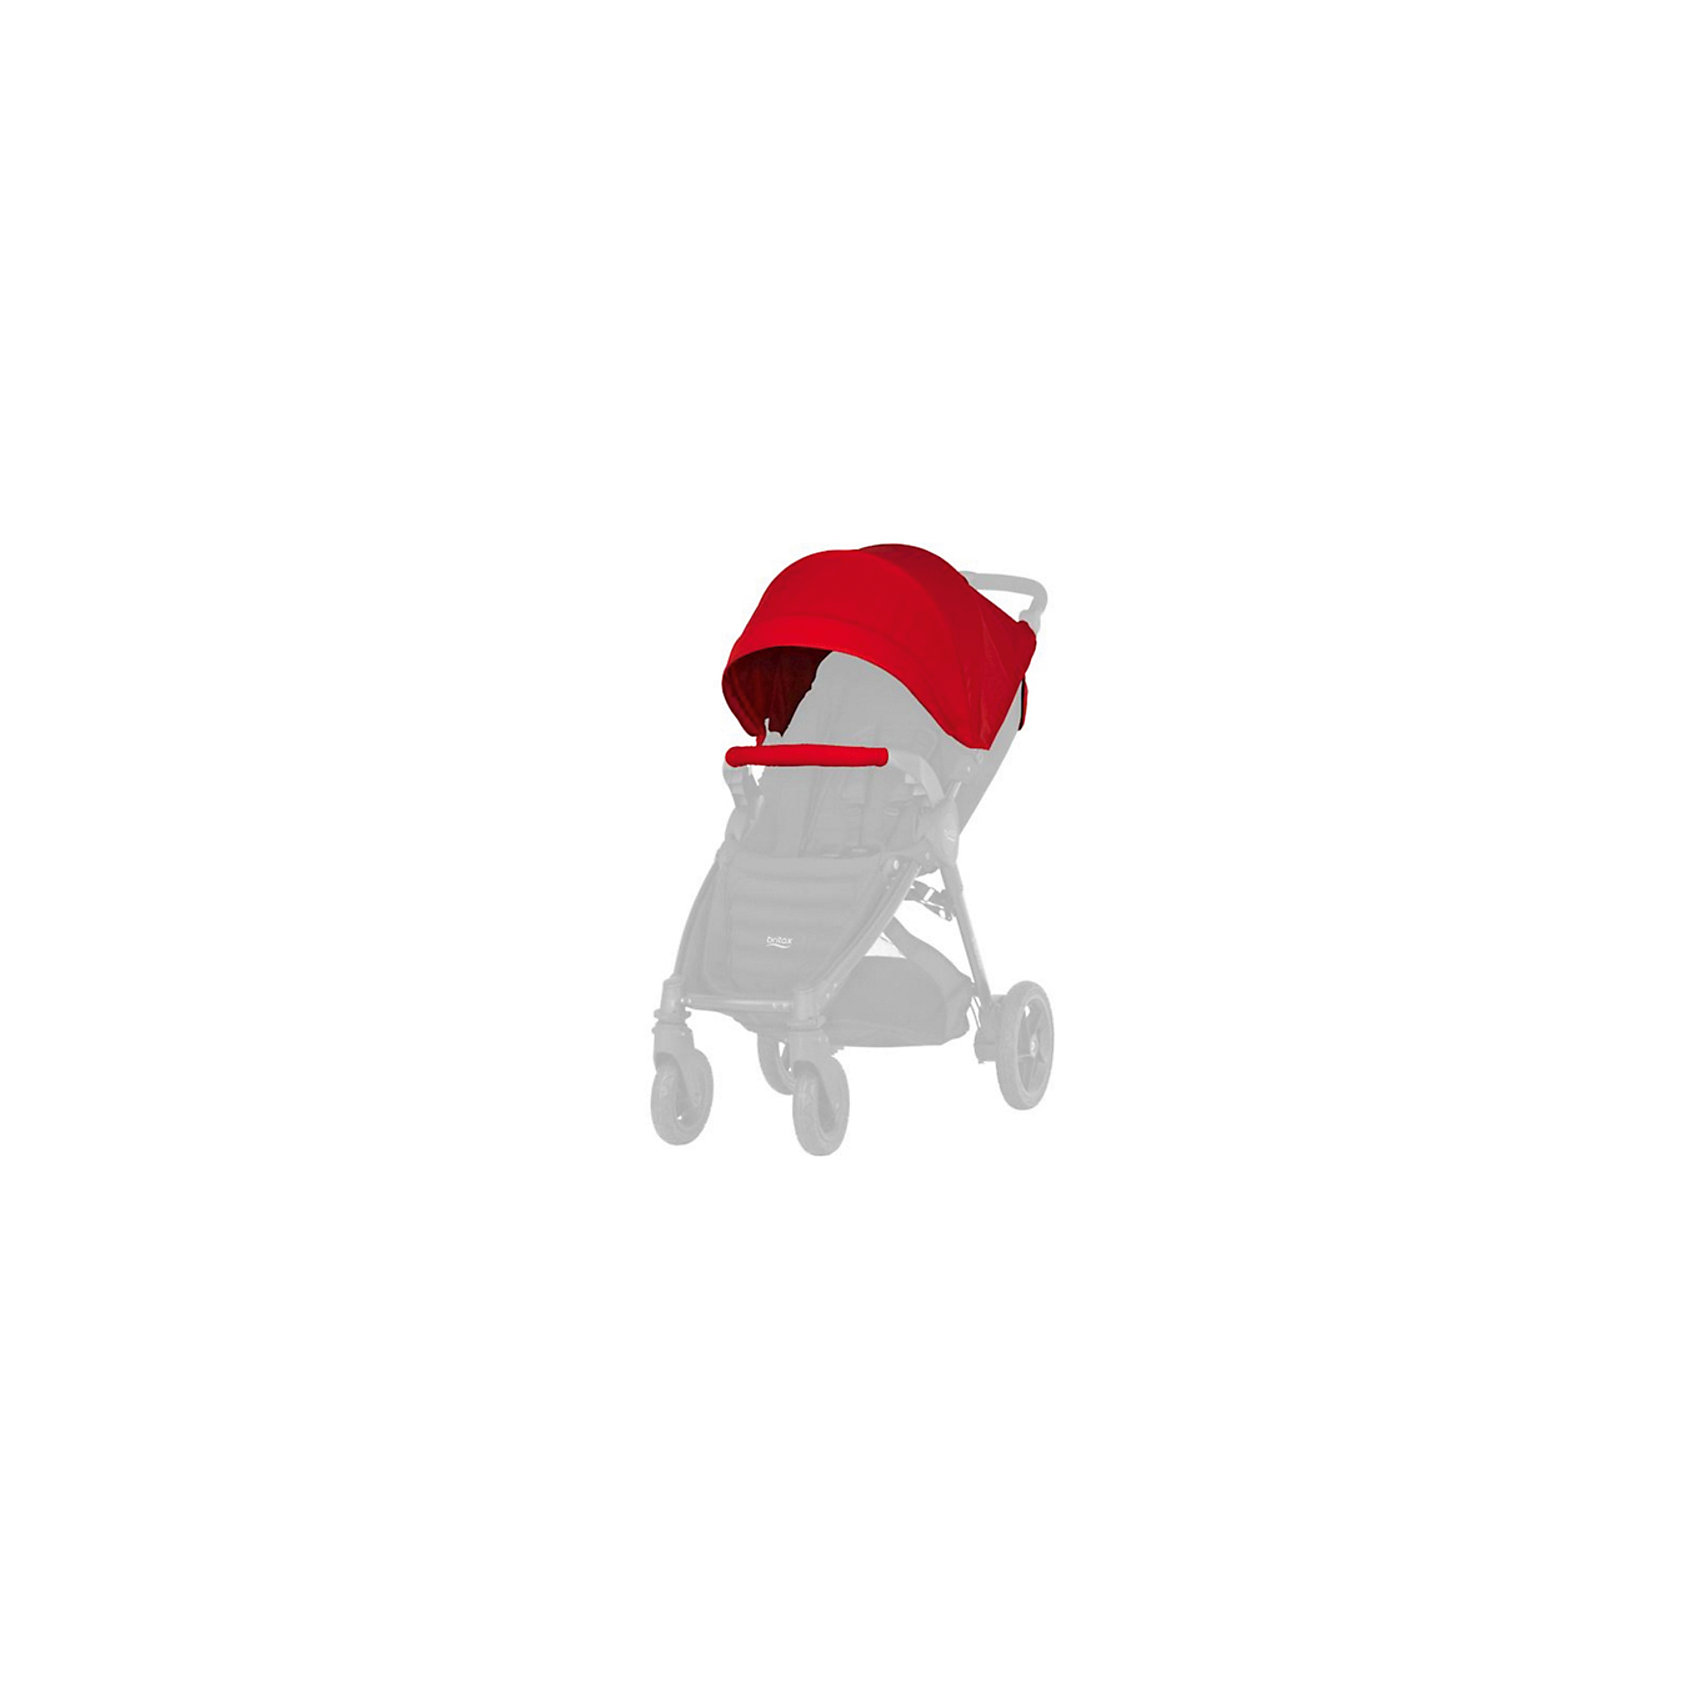 Капор для прогулочной коляски B-Agile/B-Motion, Britax, Flame Red